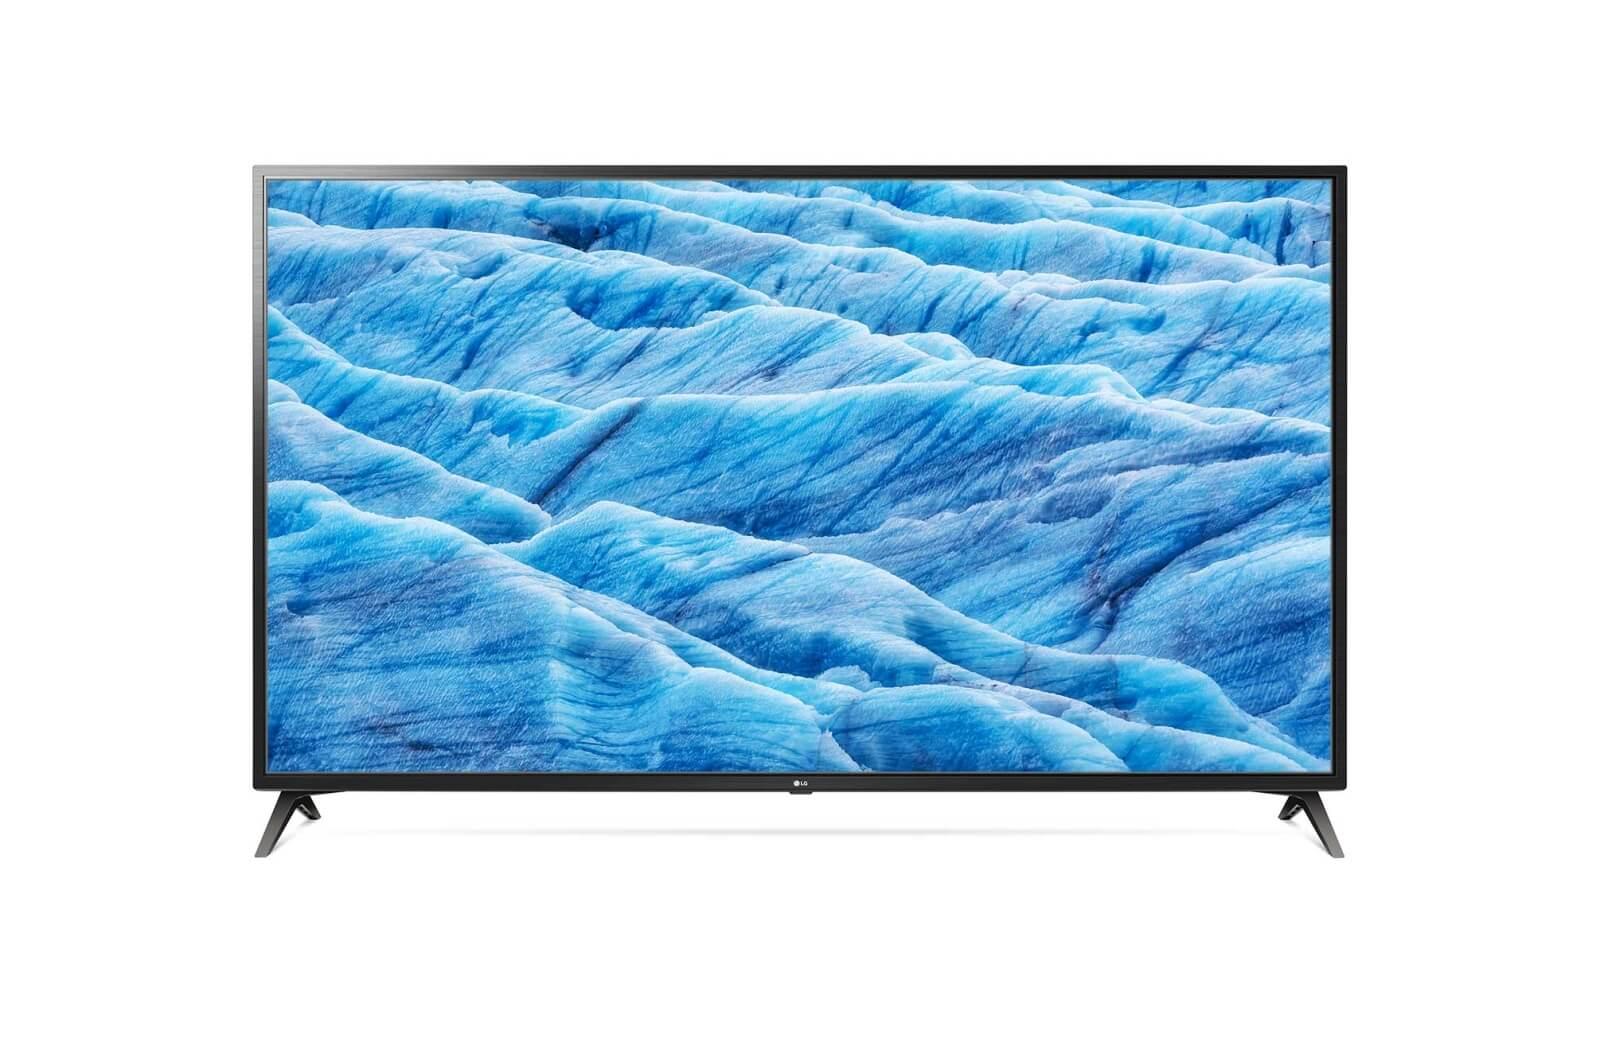 LG 70UM7100PLA 70 Inch UHD 4K HDR Smart LED TV